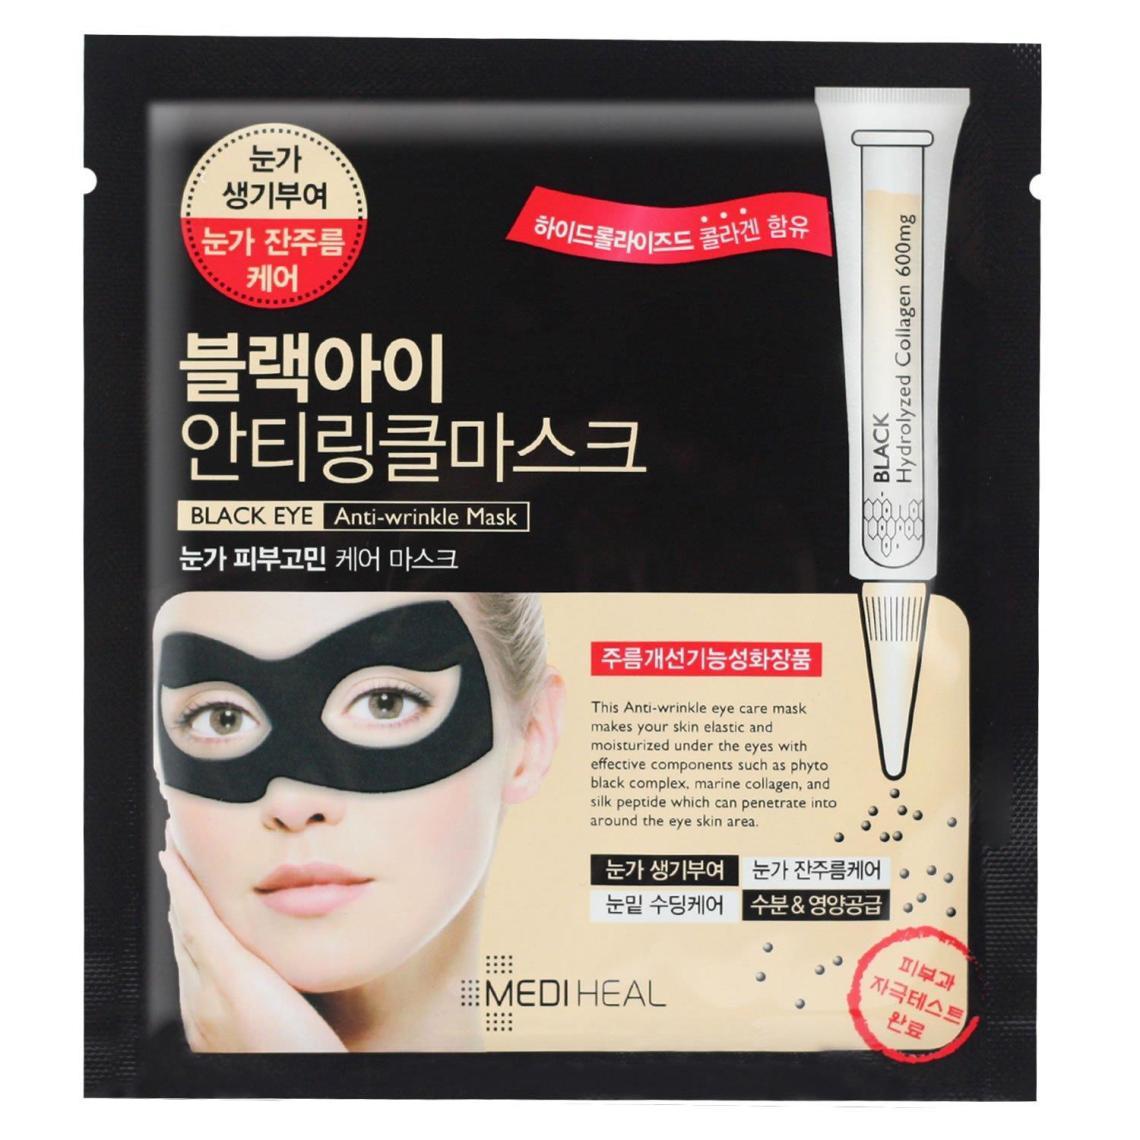 anti-wrinkle mask | Living.ca